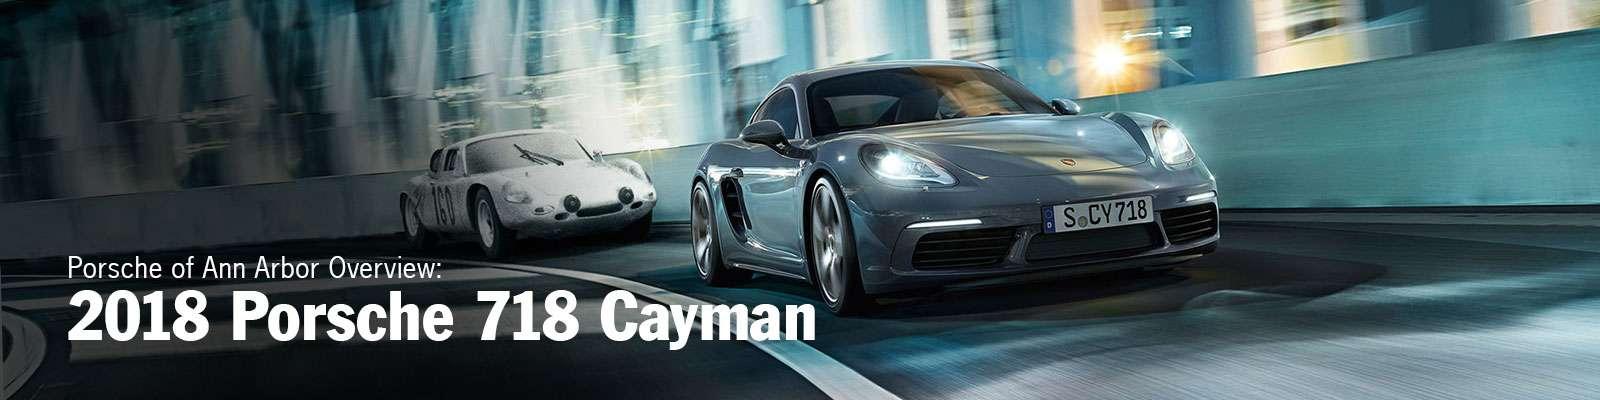 2018 Porsche 718 Cayman in Michigan